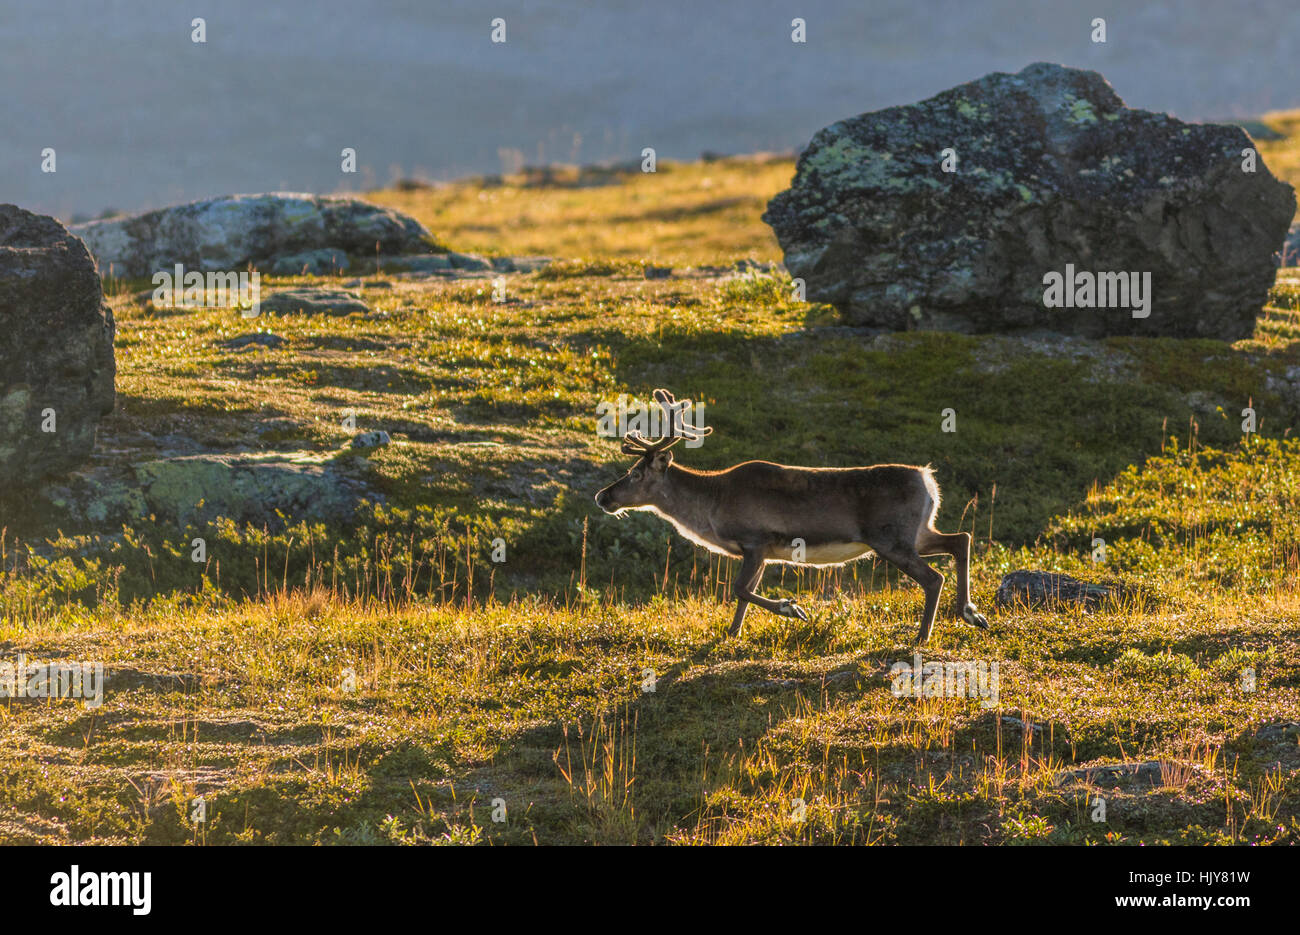 Reindeer walking in mountain, big rock in background, Kiruna, Swedish Lapland, Sweden - Stock Image